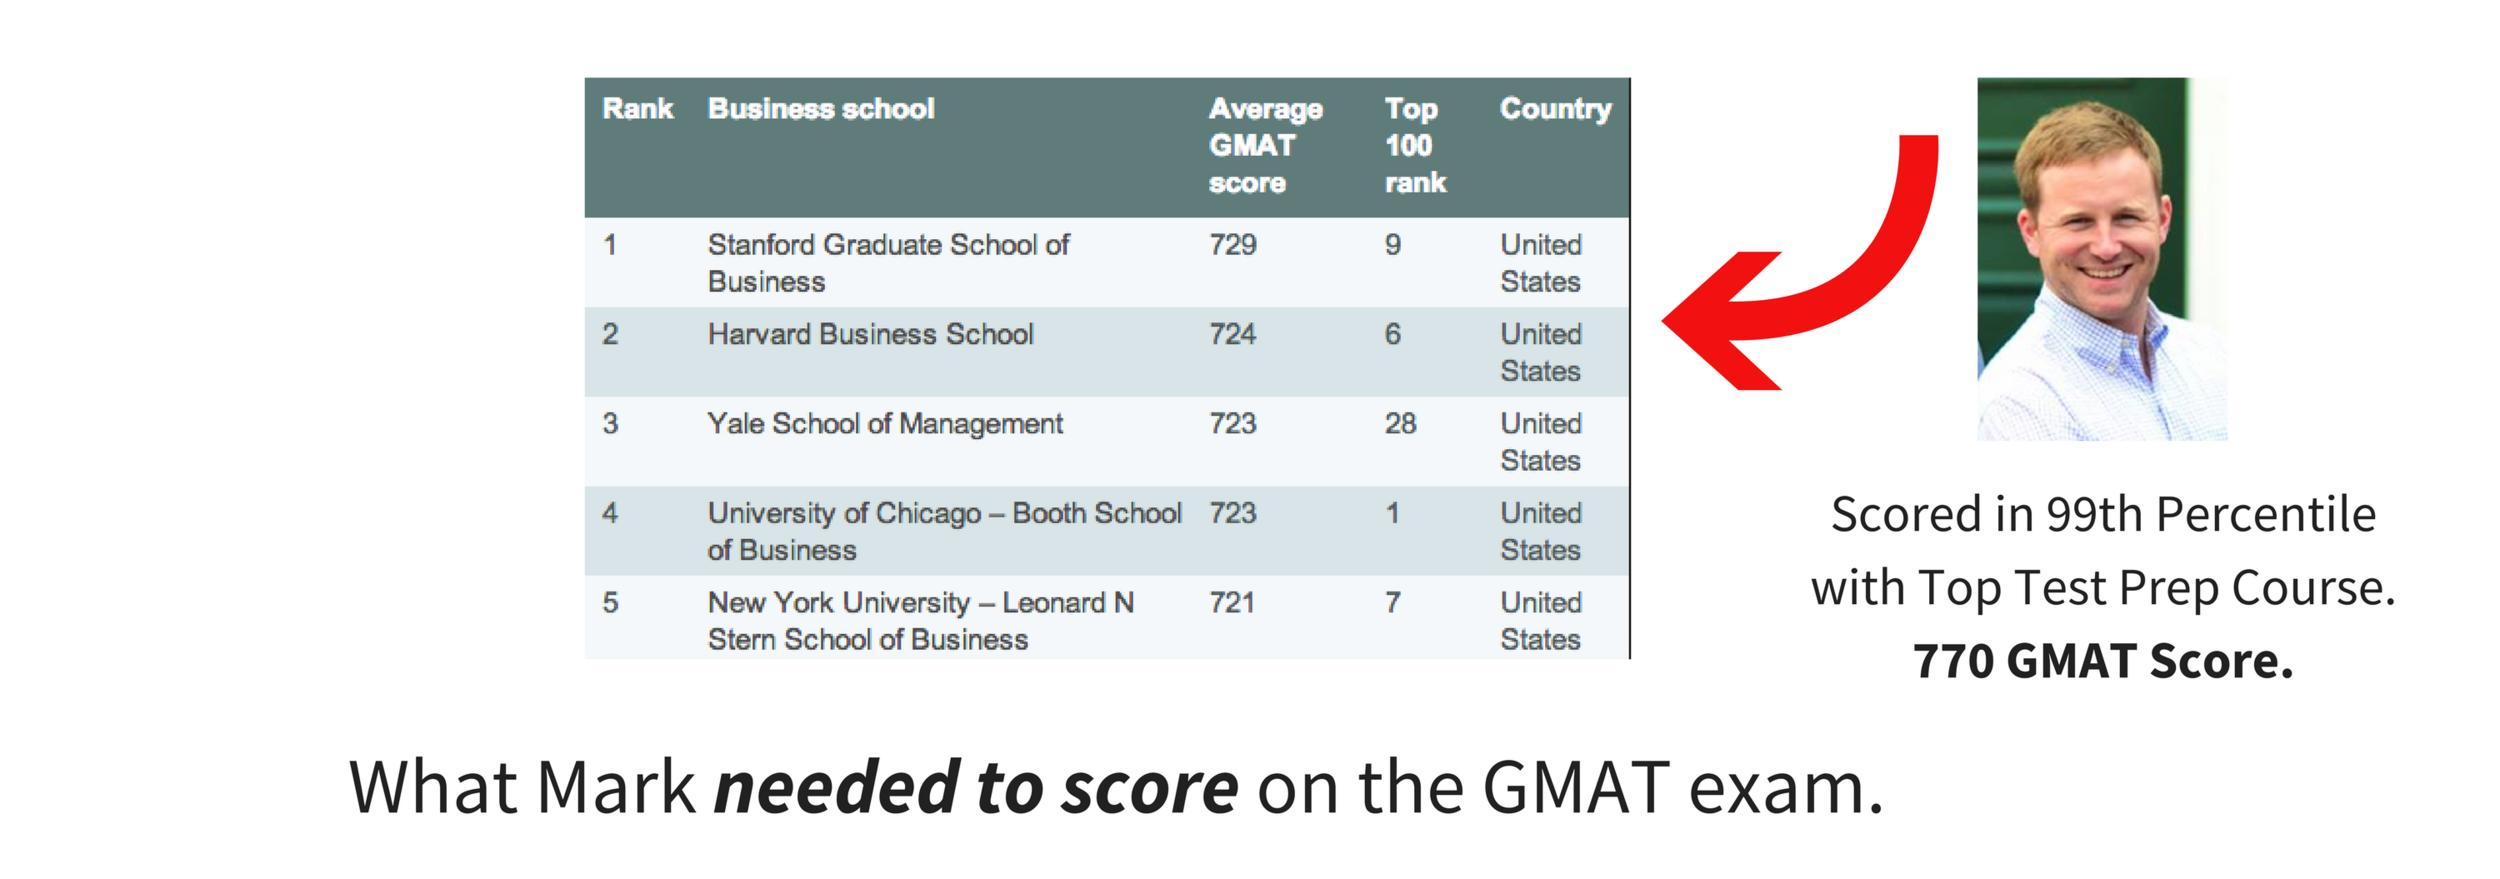 Average GMAT Scores for Best Business Schools.